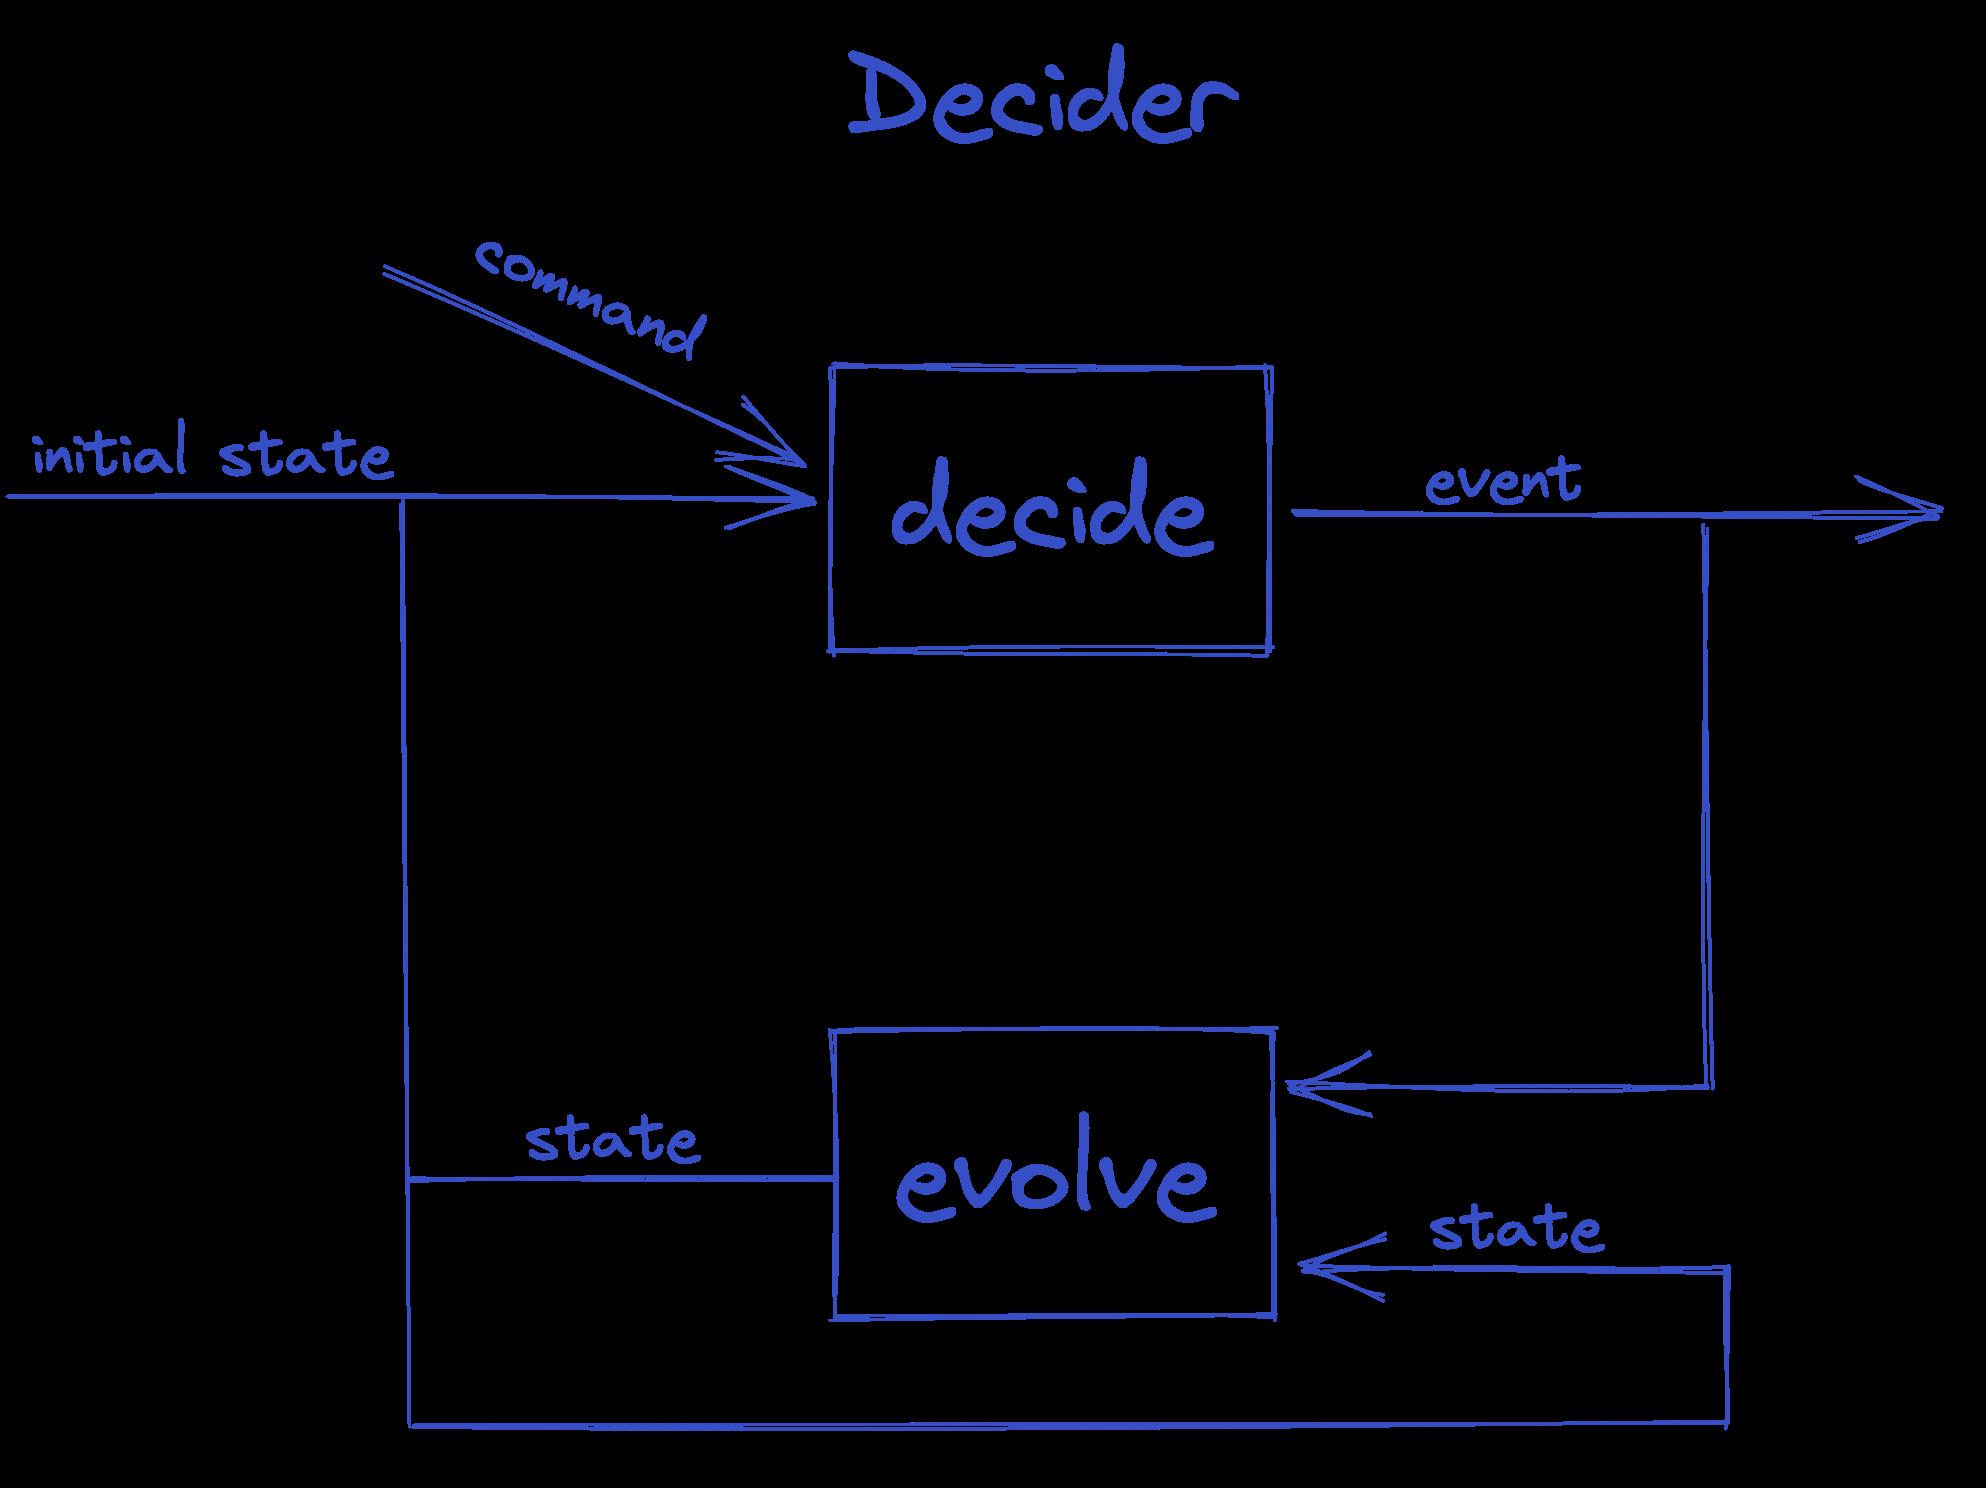 decider image